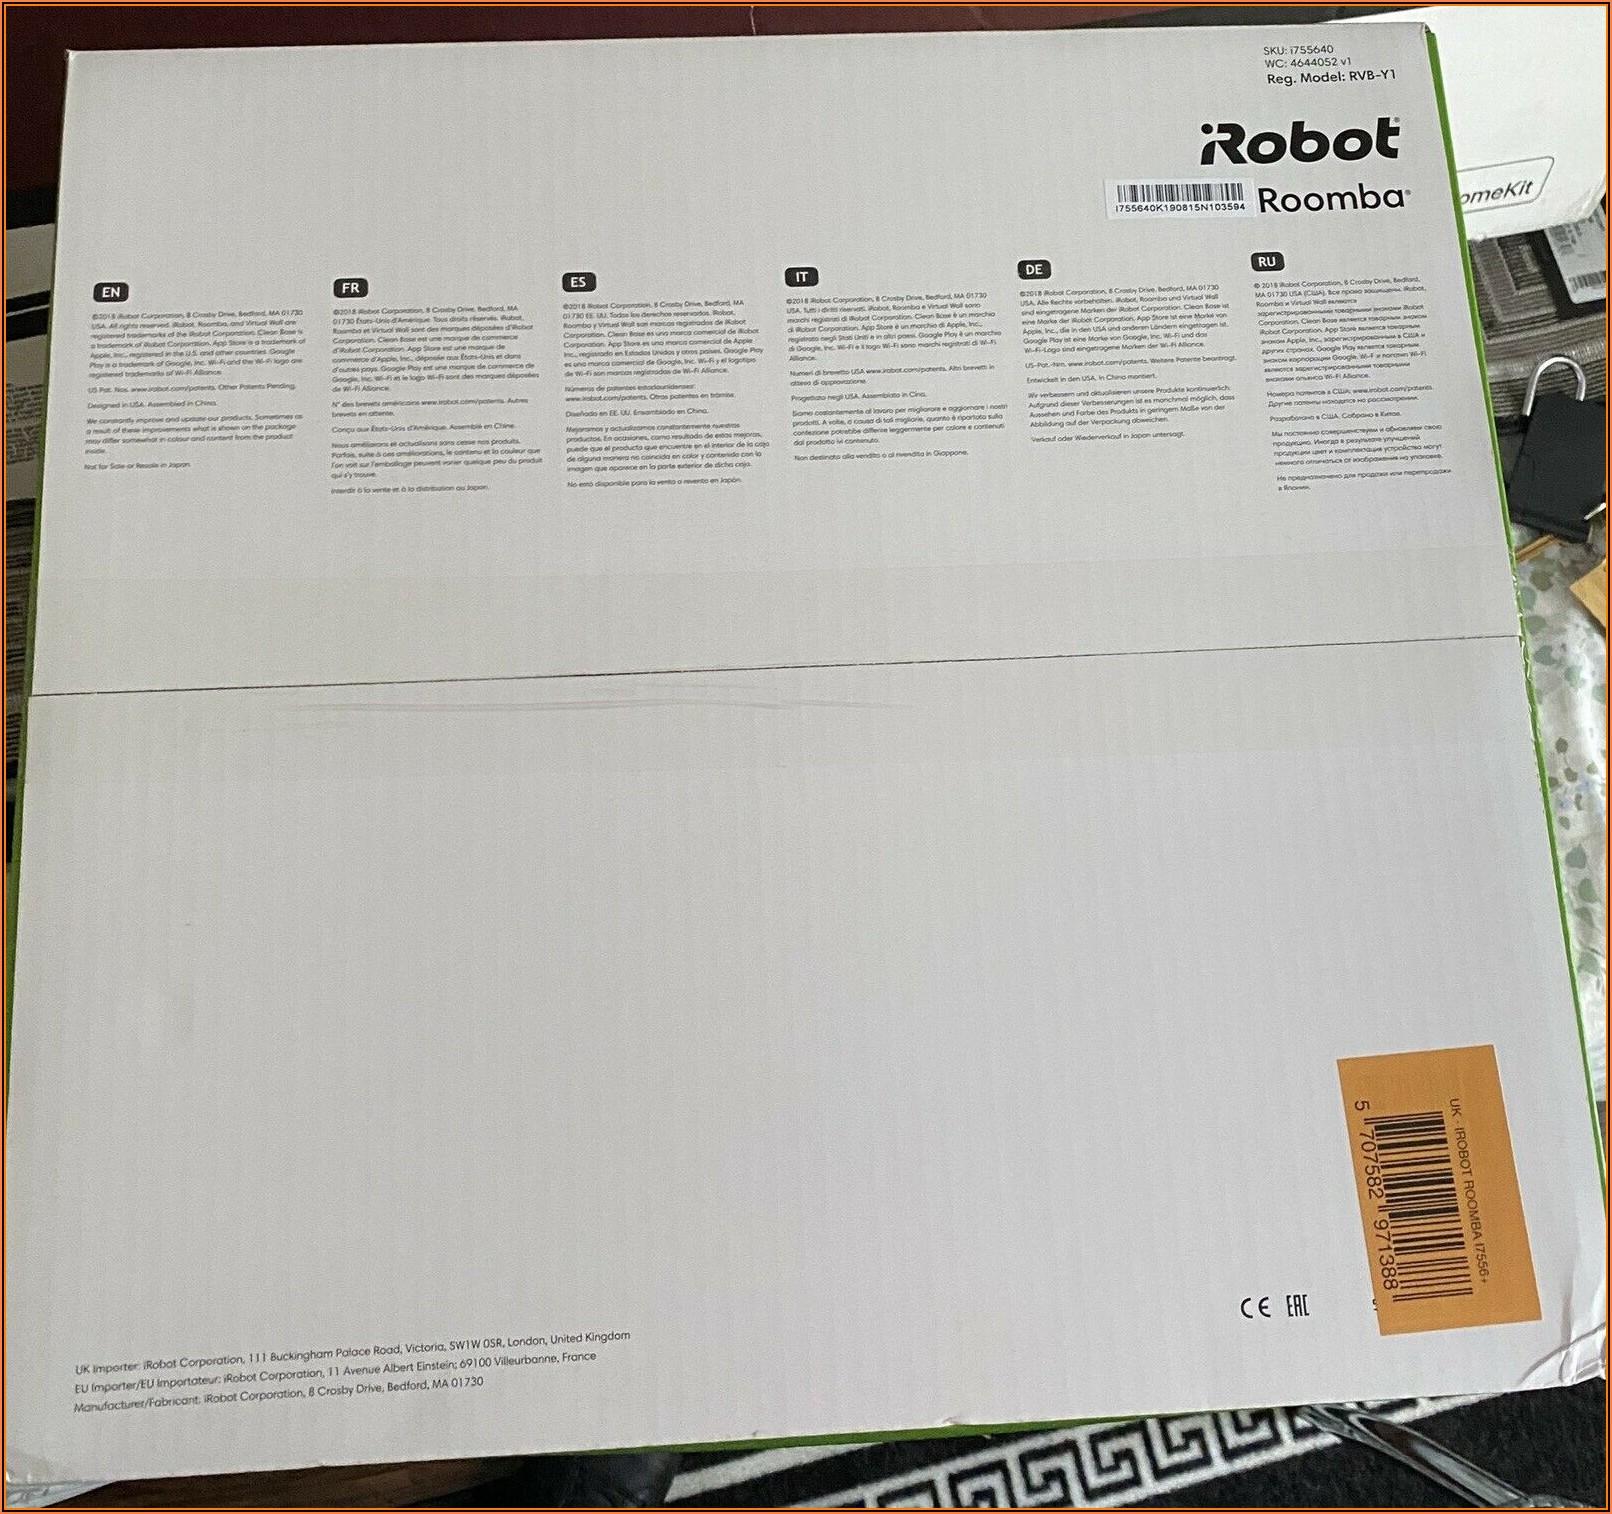 Irobot Roomba Room Mapping